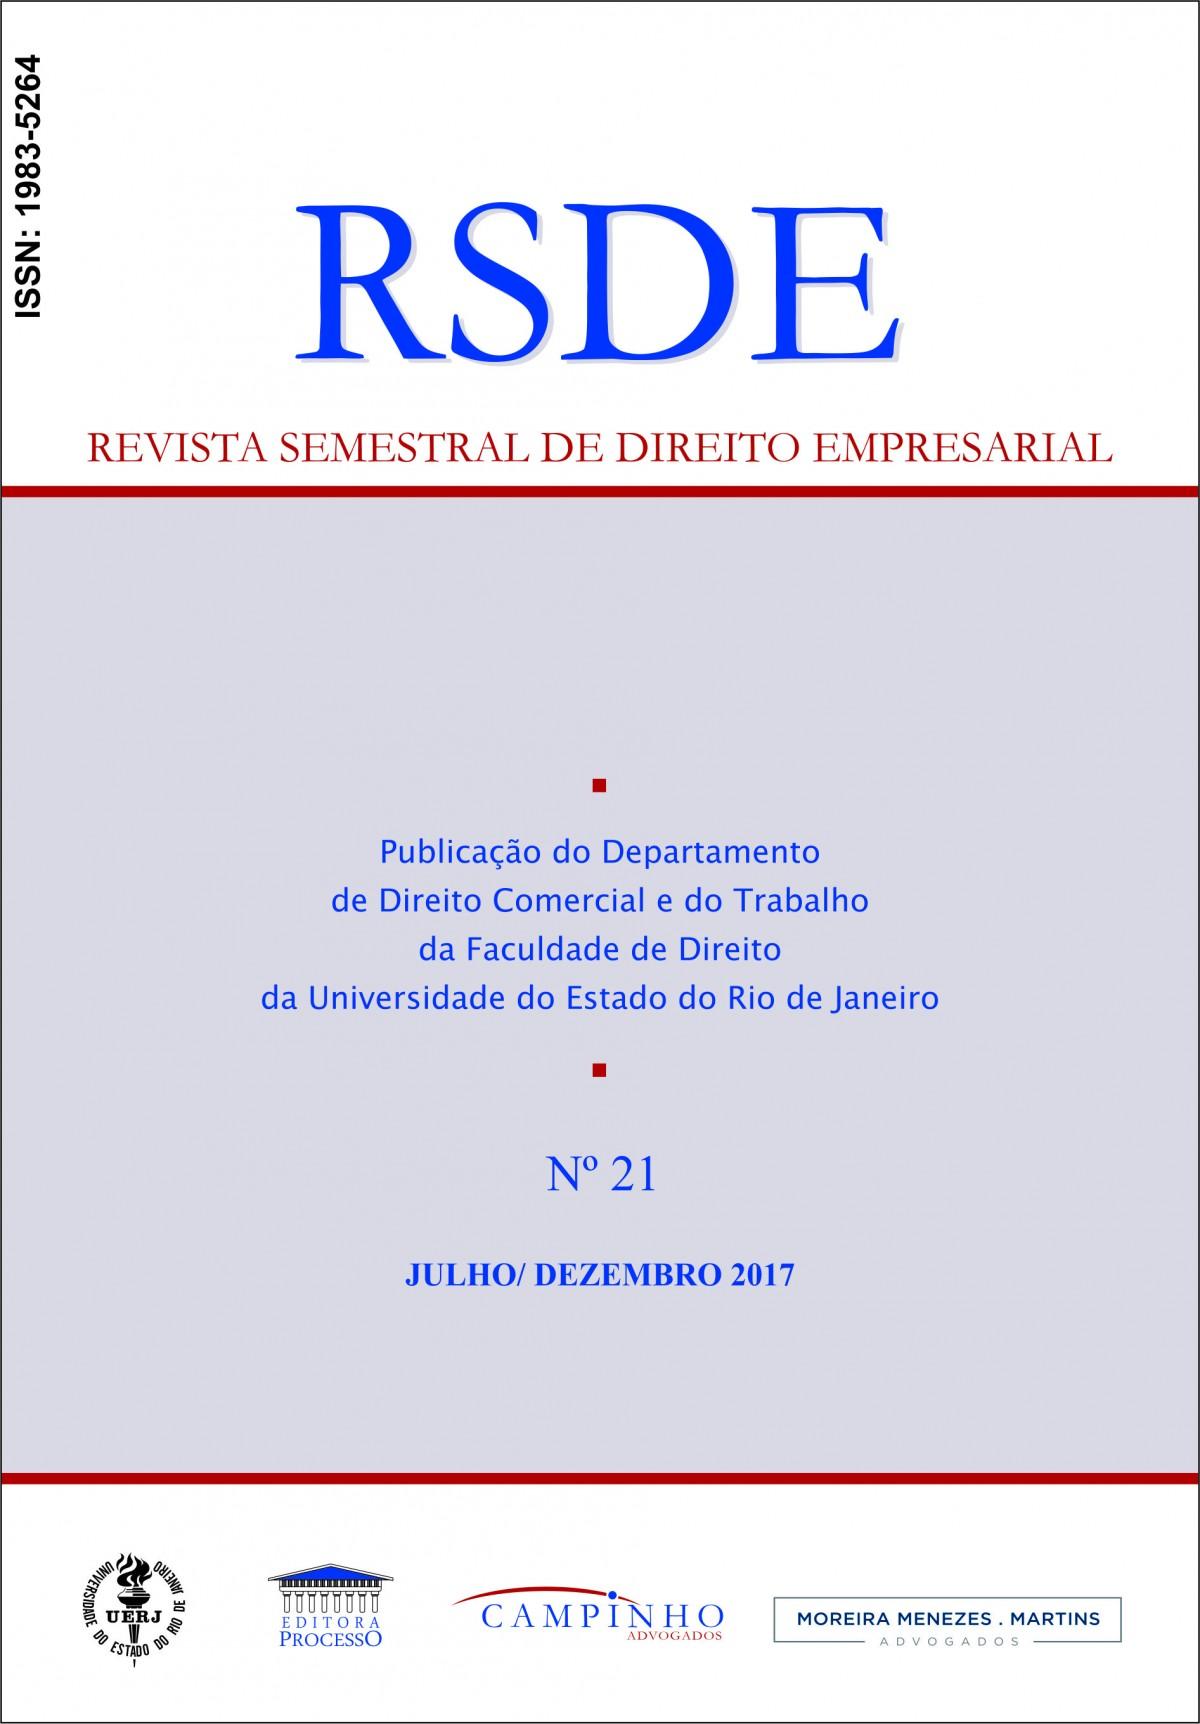 Foto 1 - RSDE Nº 21